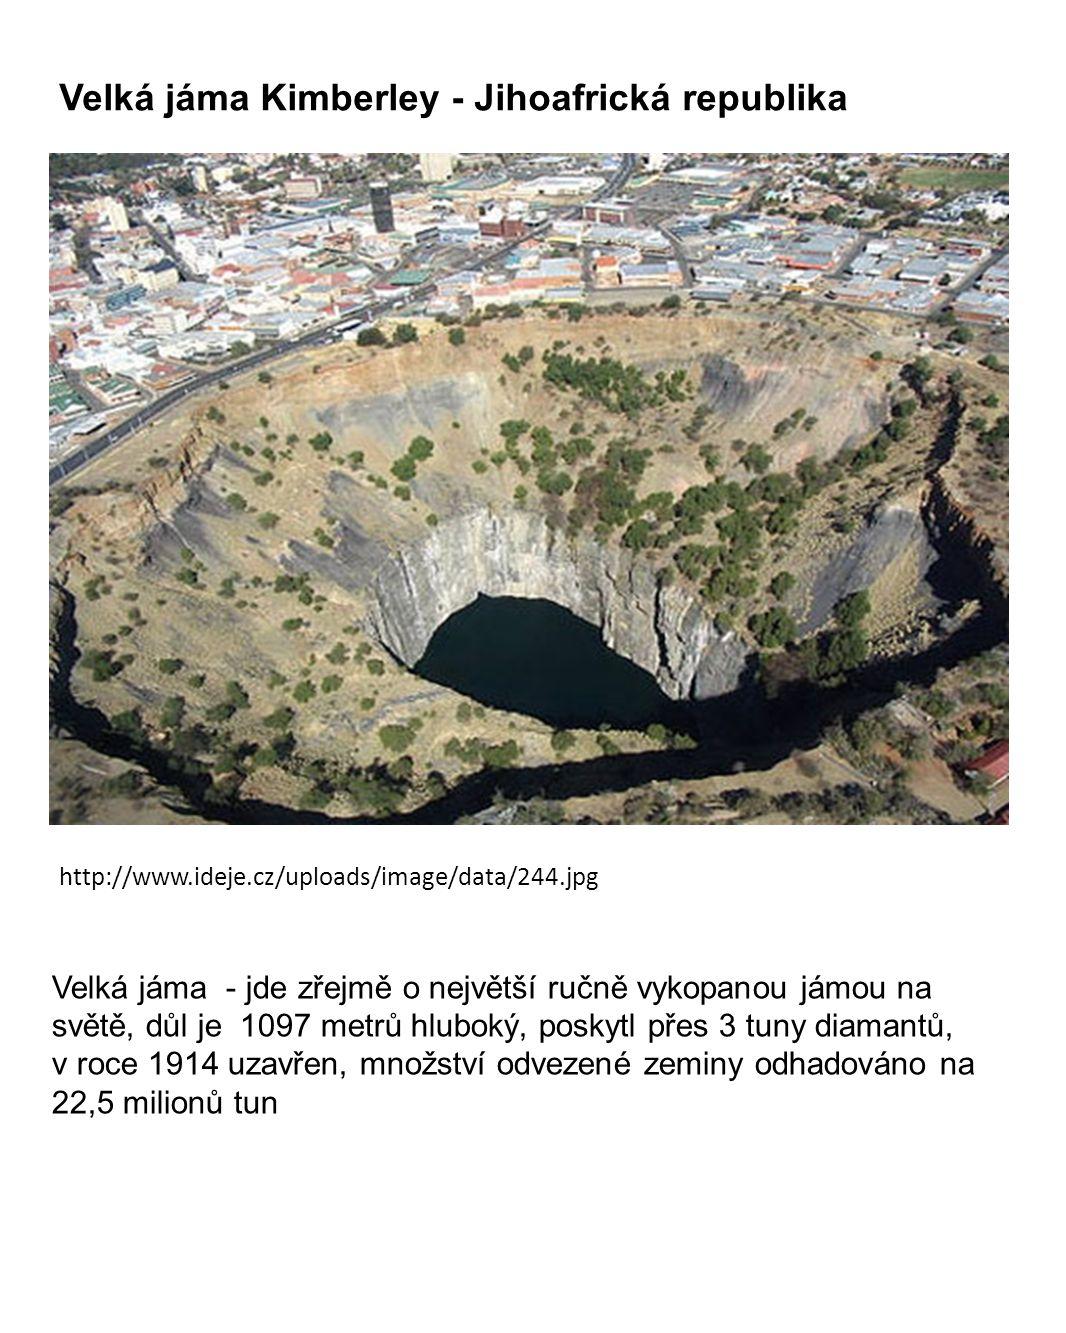 Velká jáma Kimberley - Jihoafrická republika